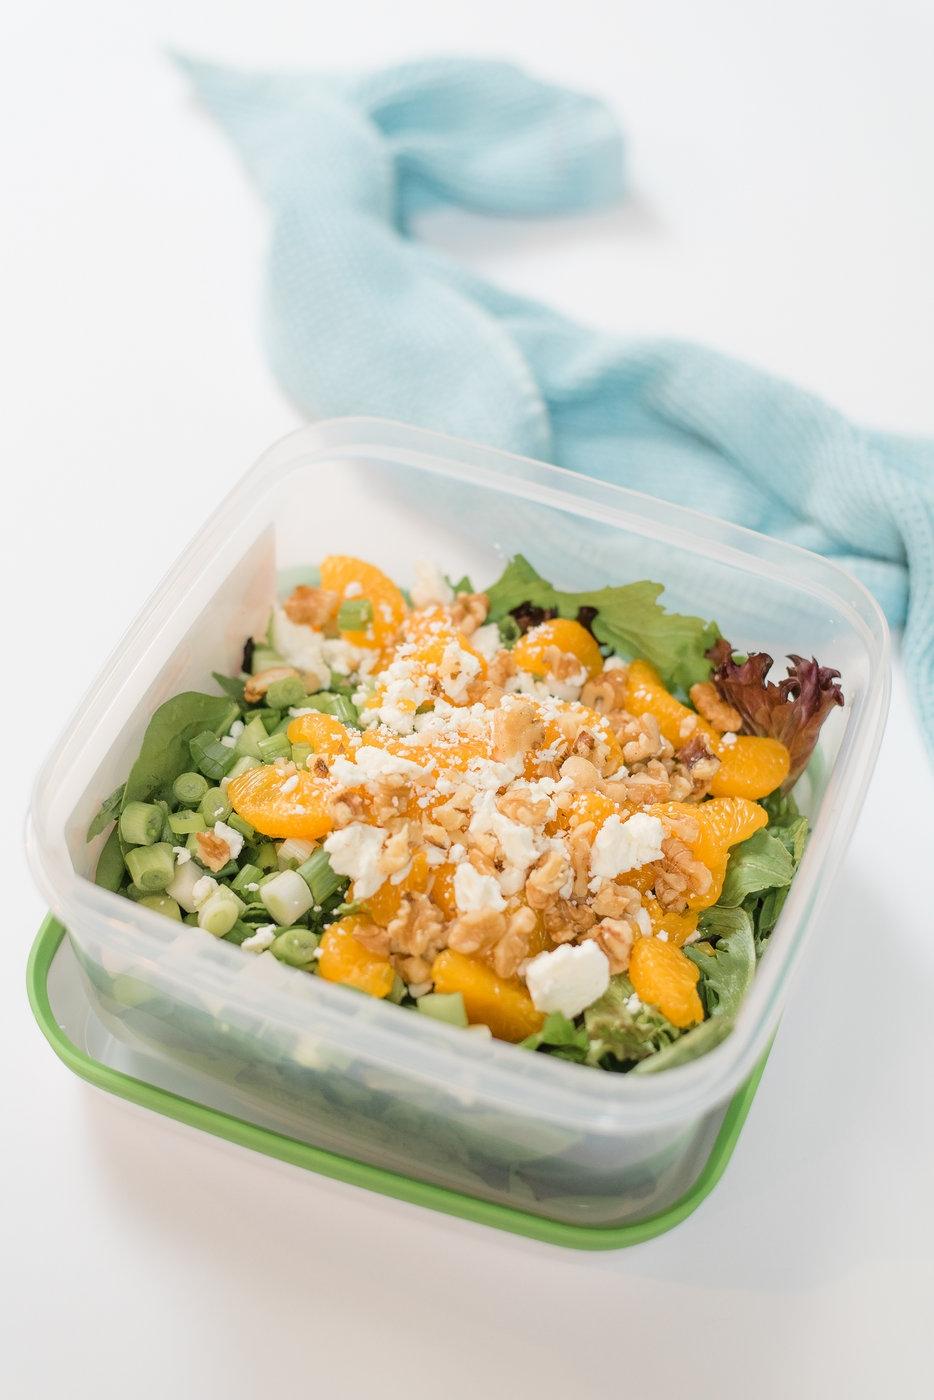 Mandarin Orange Salad Recipe by Alabama Life + Food blogger, Heather Brown // My Life Well Loved